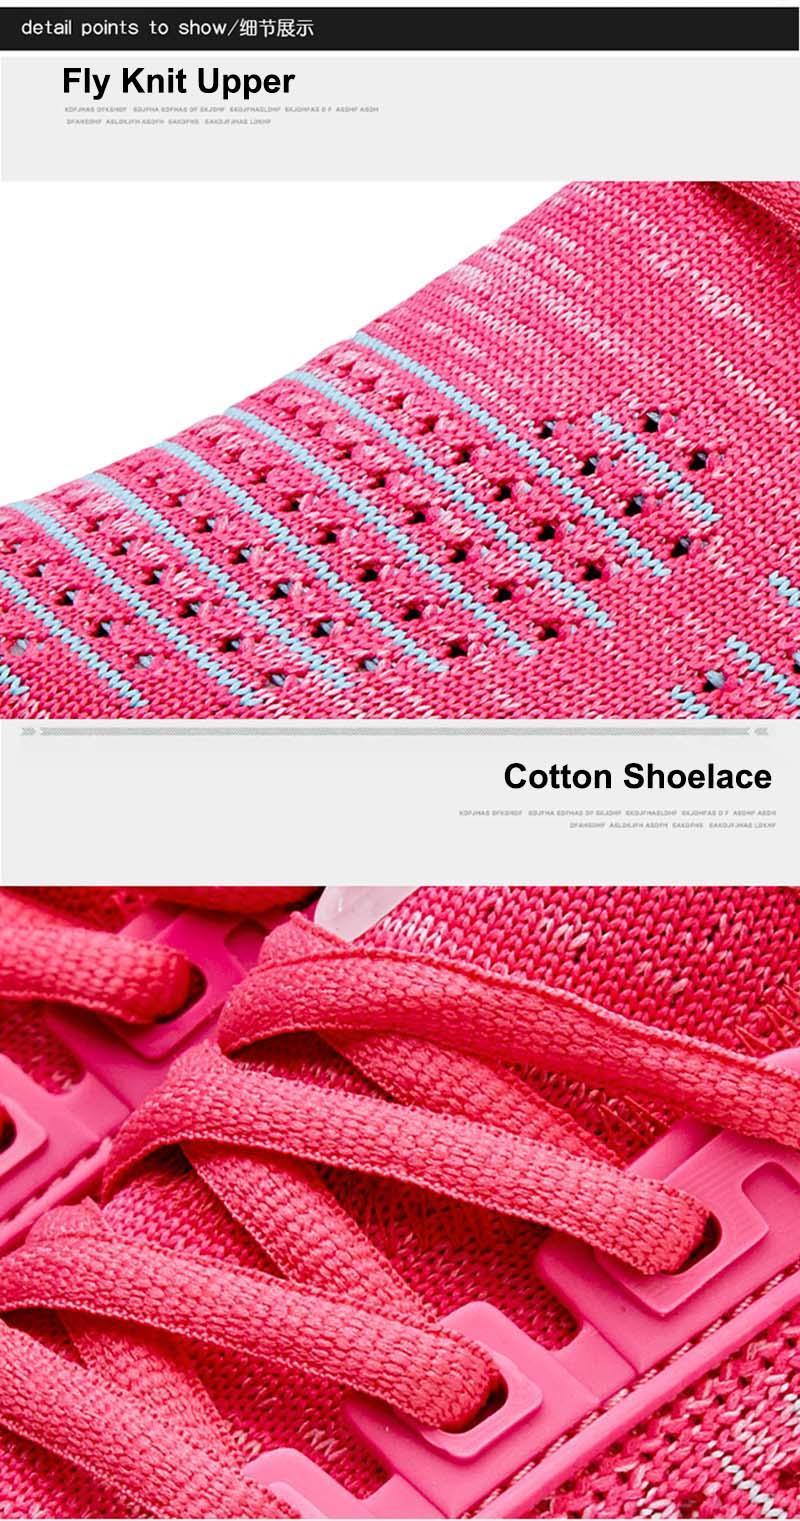 fashion-shoes-casual-style-sneakers-men-women-running-shoes (8)